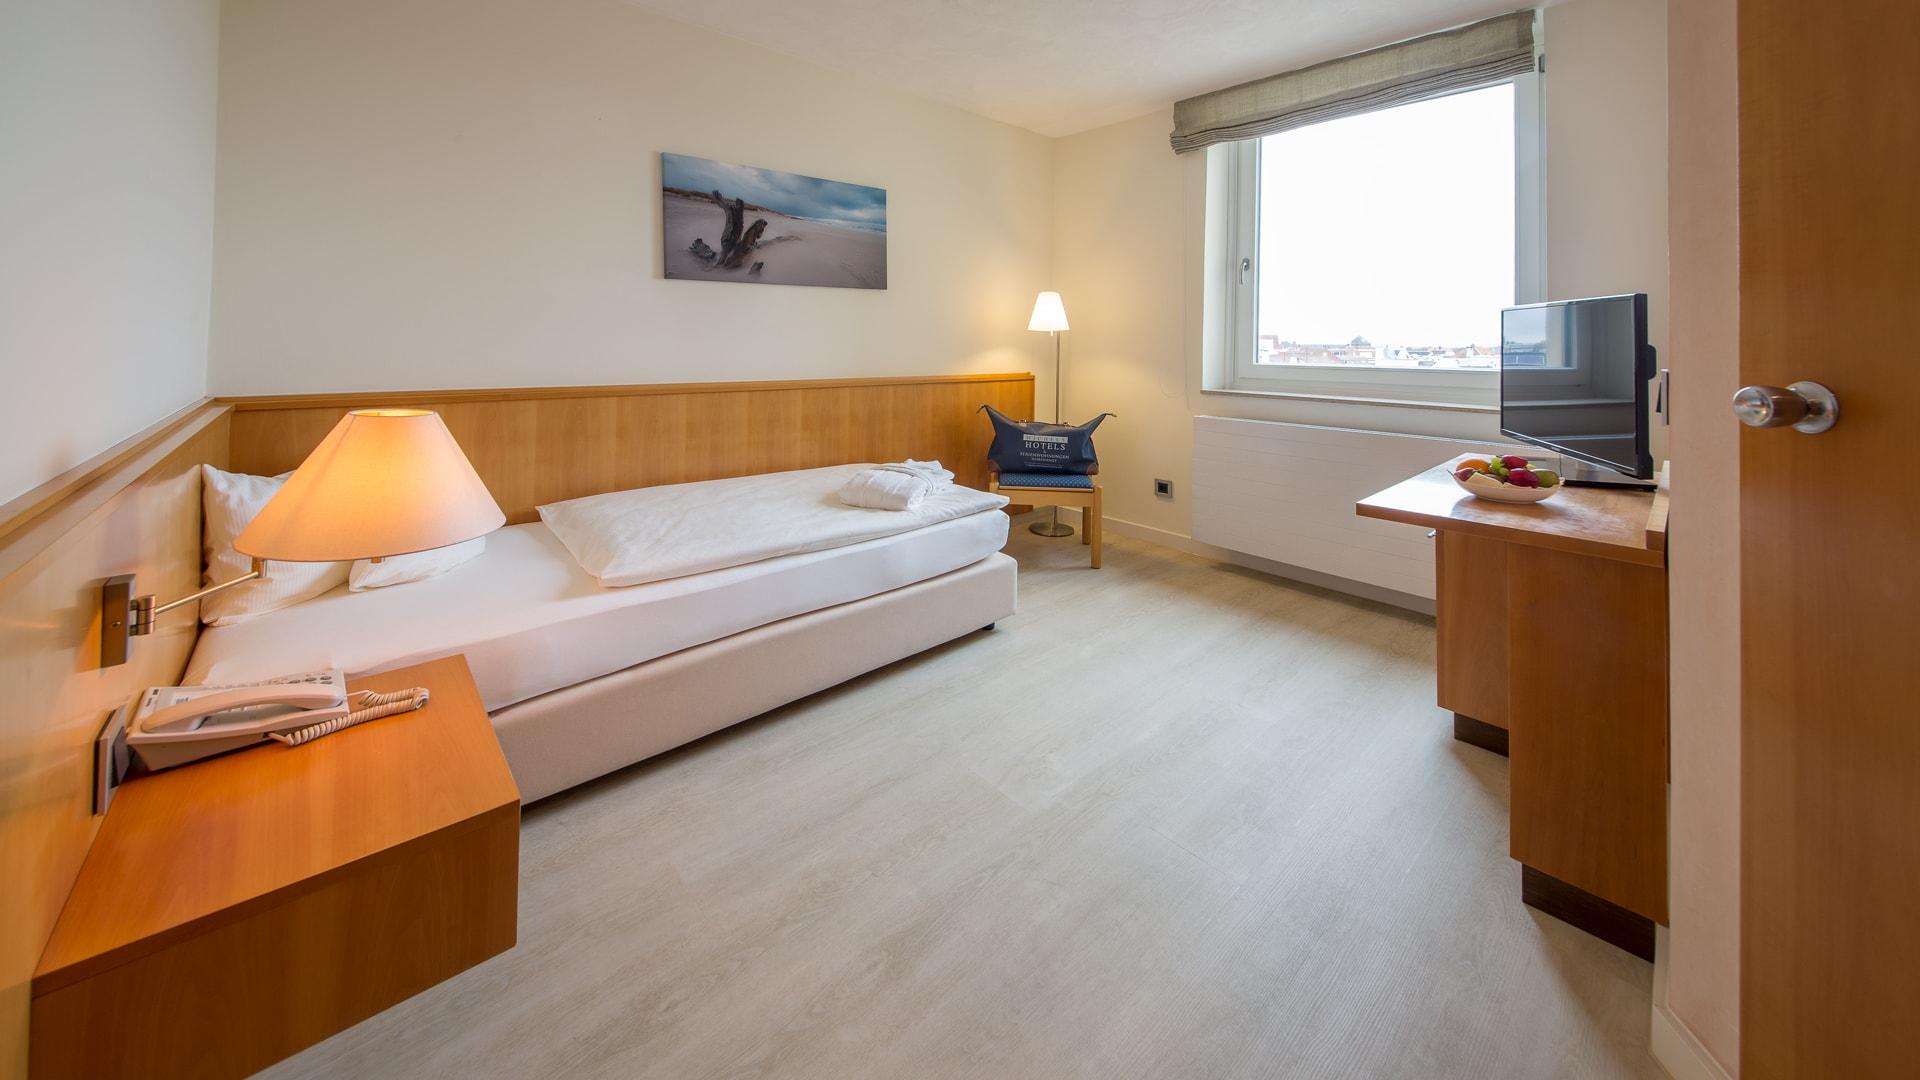 41 Michels_Hotels_Strandhotel_Germania_Familiensuite_Seeseite_Drittes_Bett